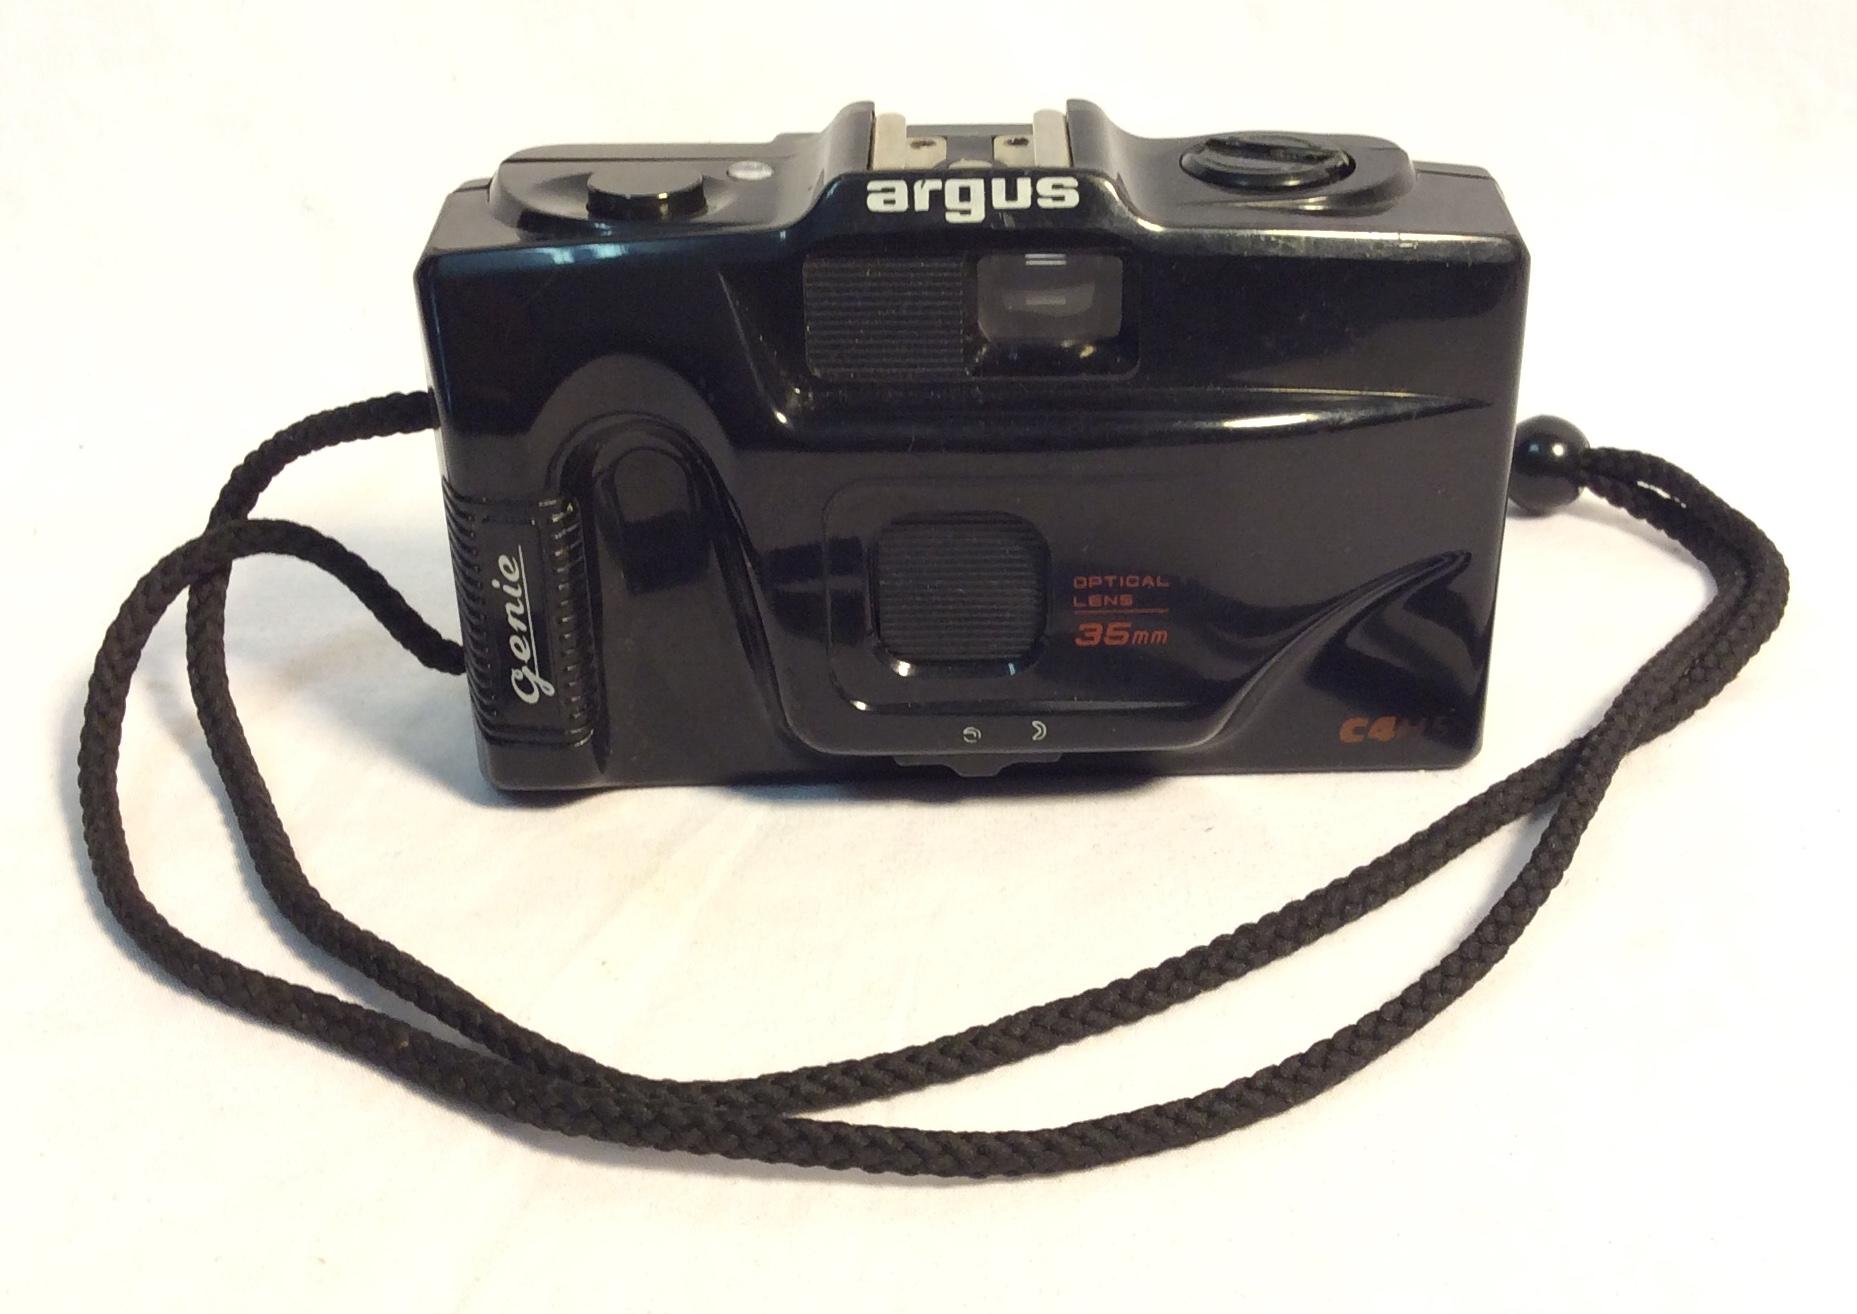 Argus Genie Camera 35mm